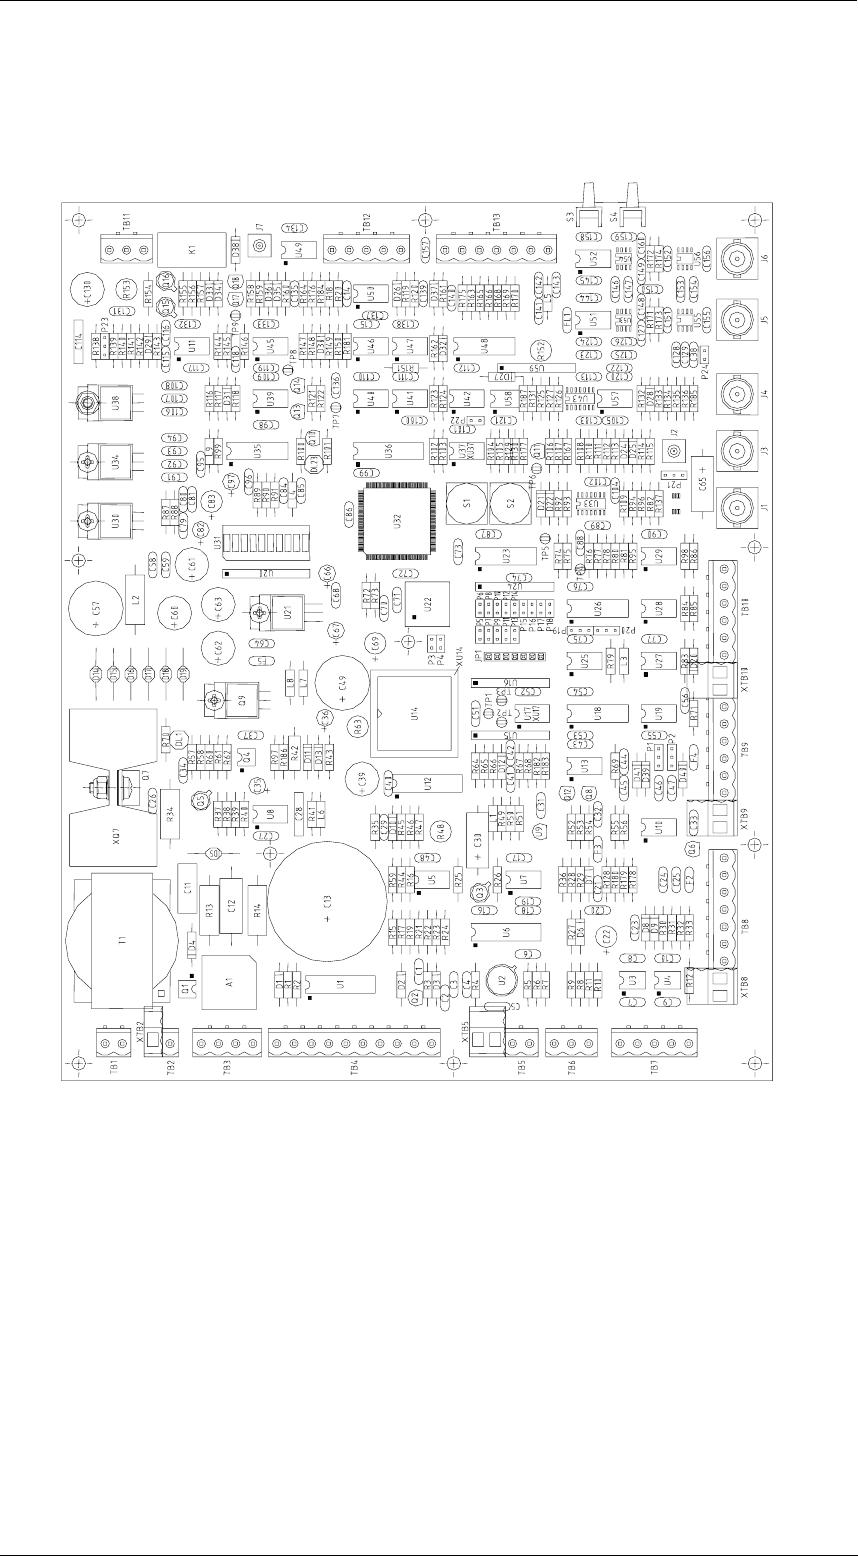 Consilium Marine Us 0009n011 30k Watt S Band Radar User 1kw Rmsmosfetamplifier Service Manual Free Download Schematics 30 Kw U Antenna Group